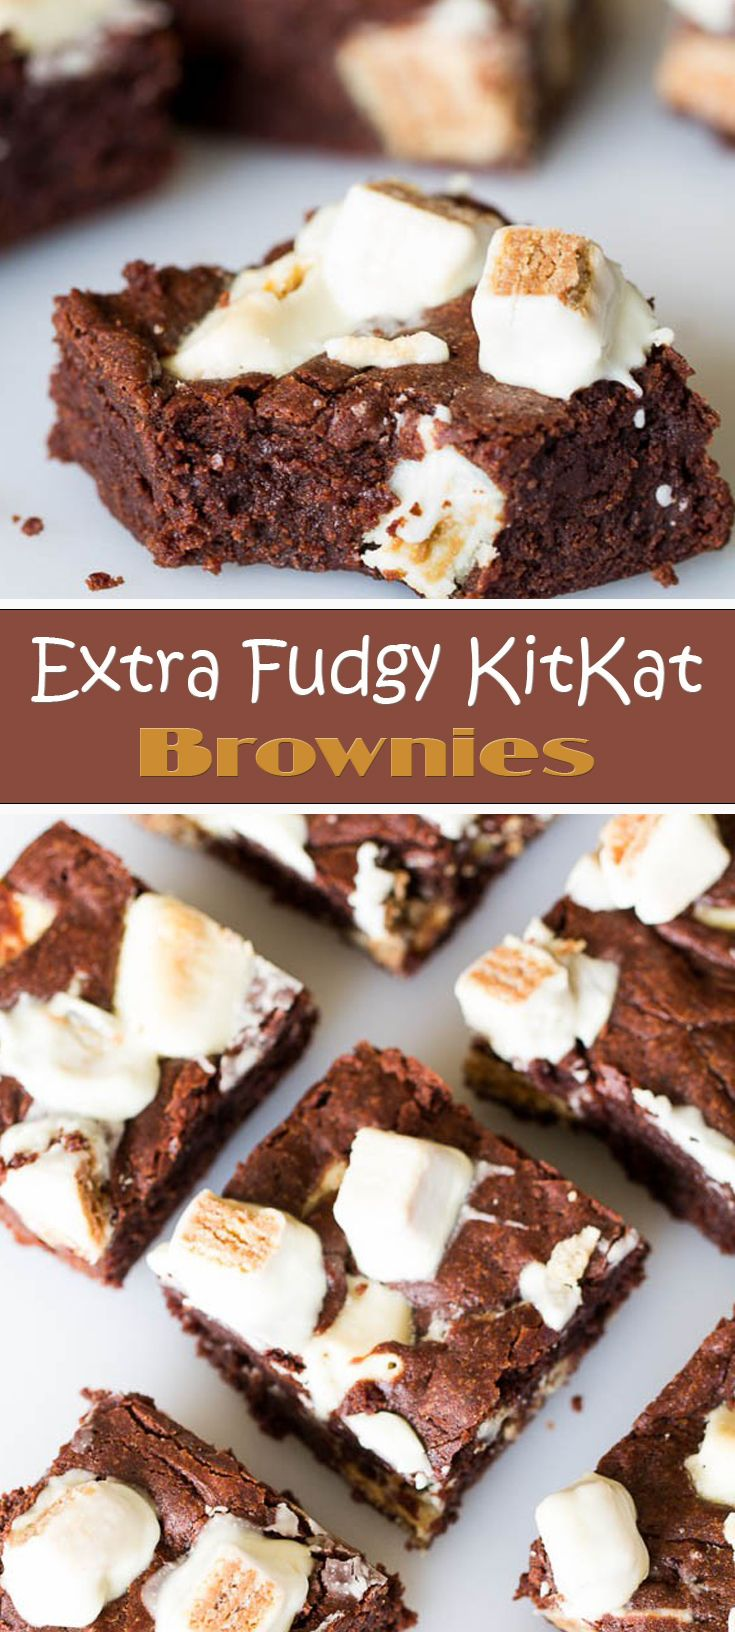 Extra Fudgy KitKat Brownies